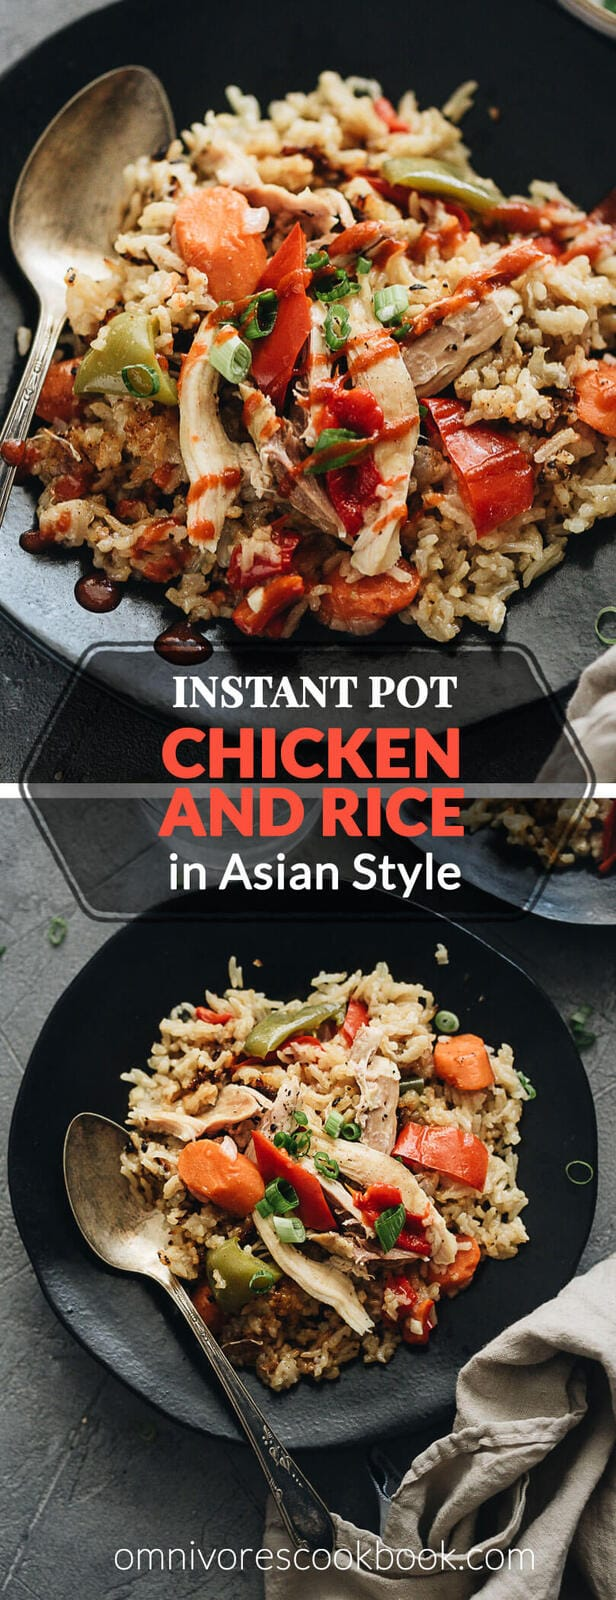 Asian Instant Pot Chicken And Rice A Pressure Cooker Recipe Omnivore S Cookbook